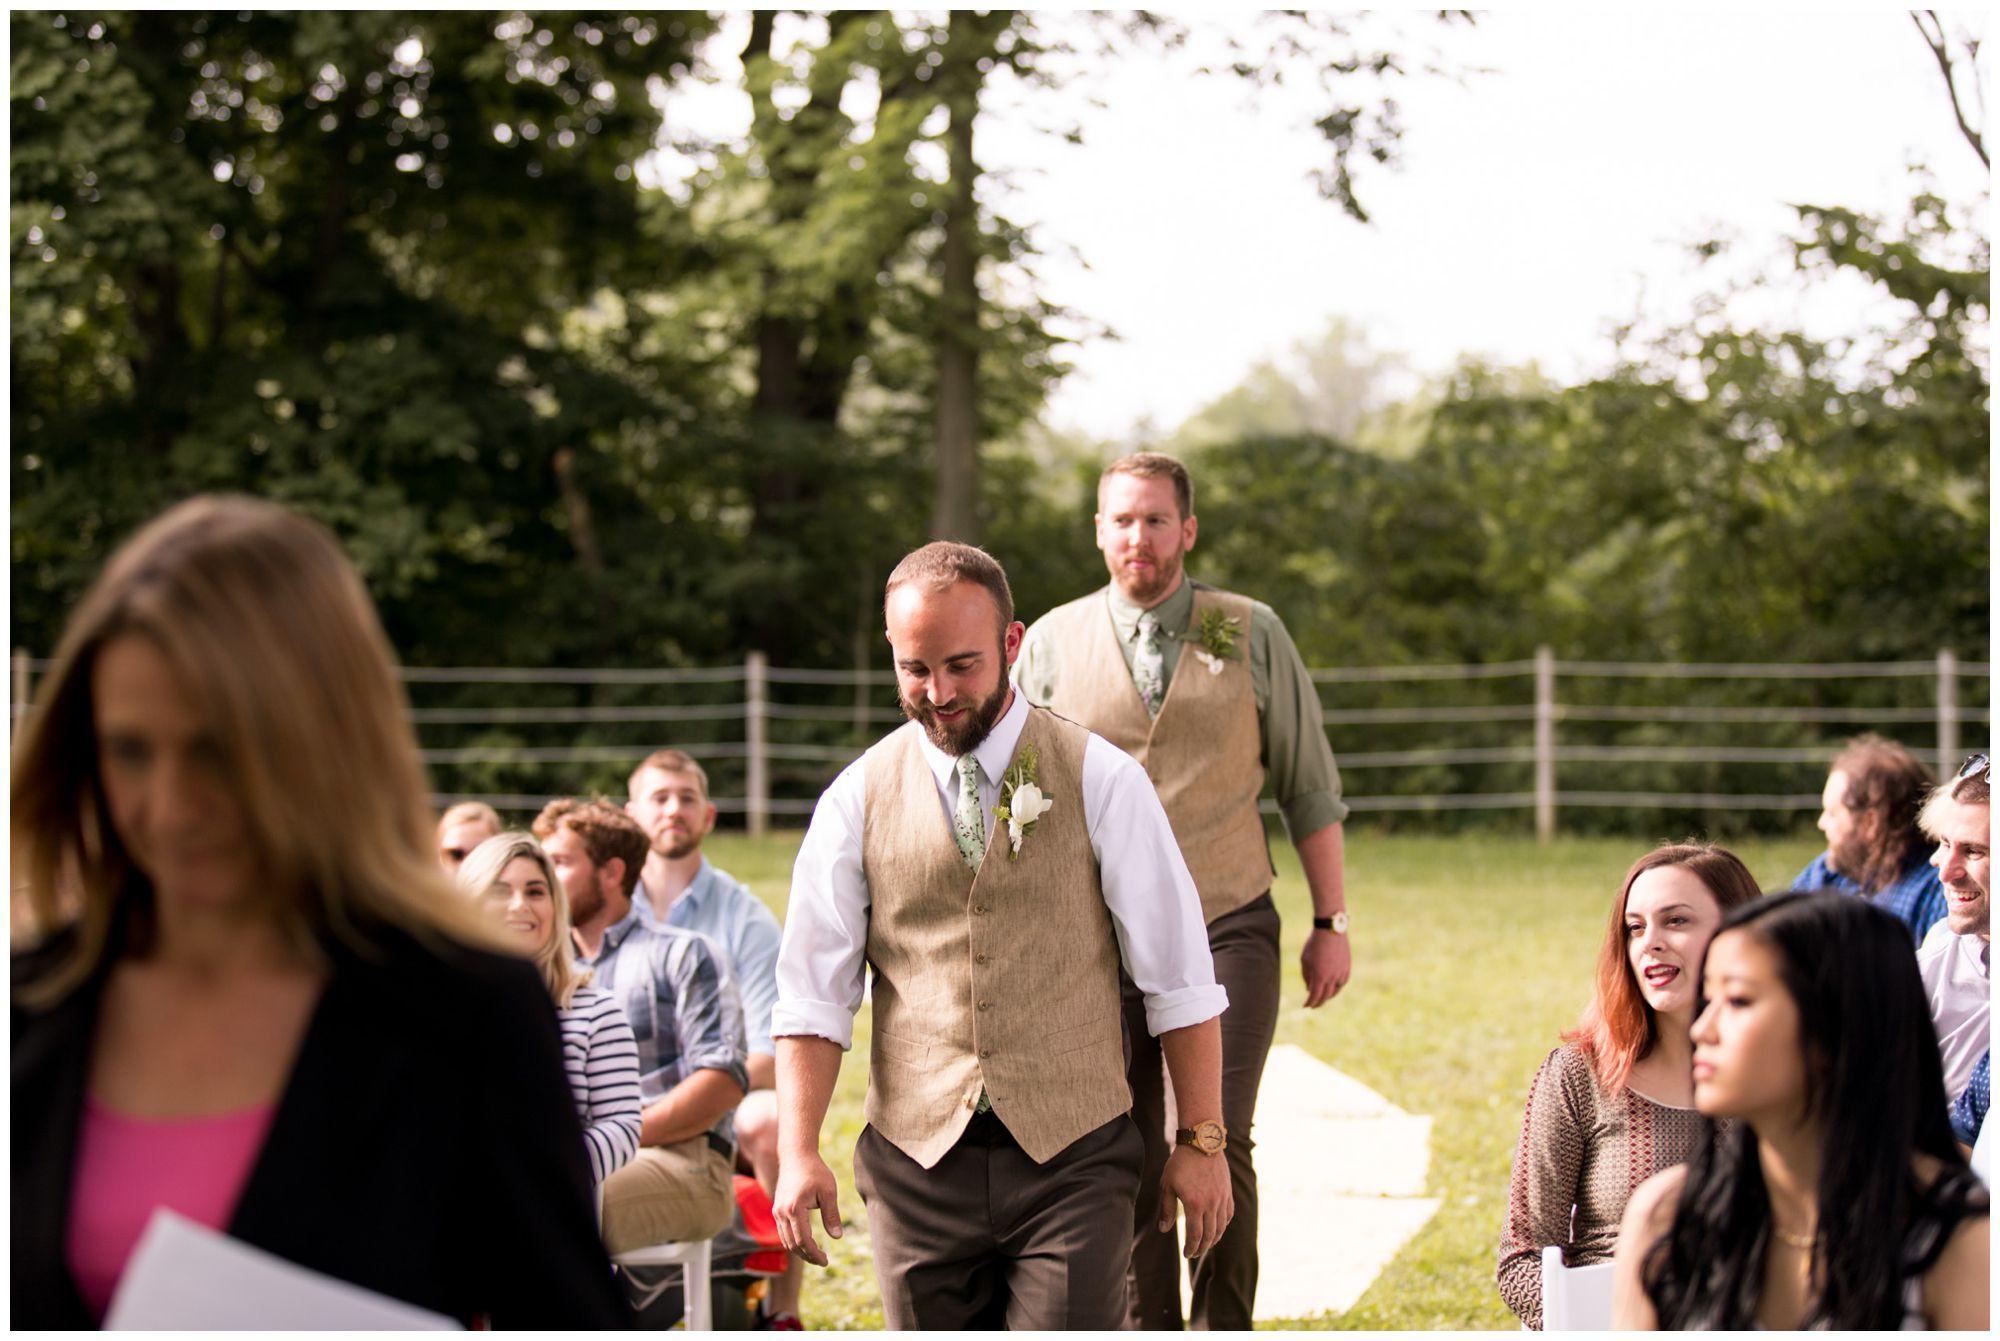 groom walks into wedding ceremony with best man behind